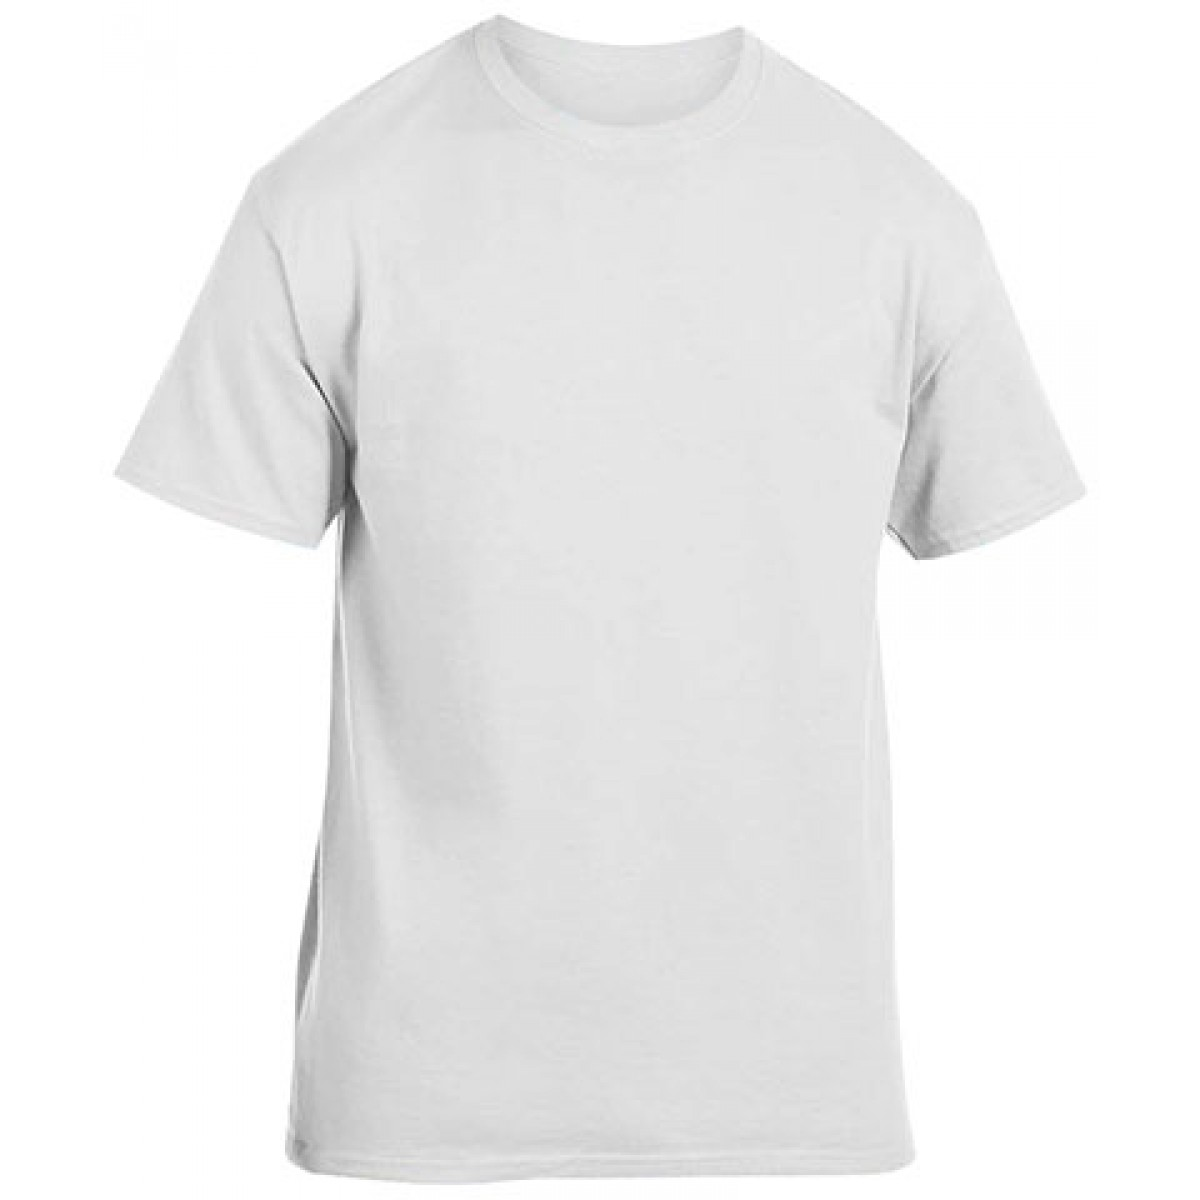 Cotton Short Sleeve T-Shirt-White-L